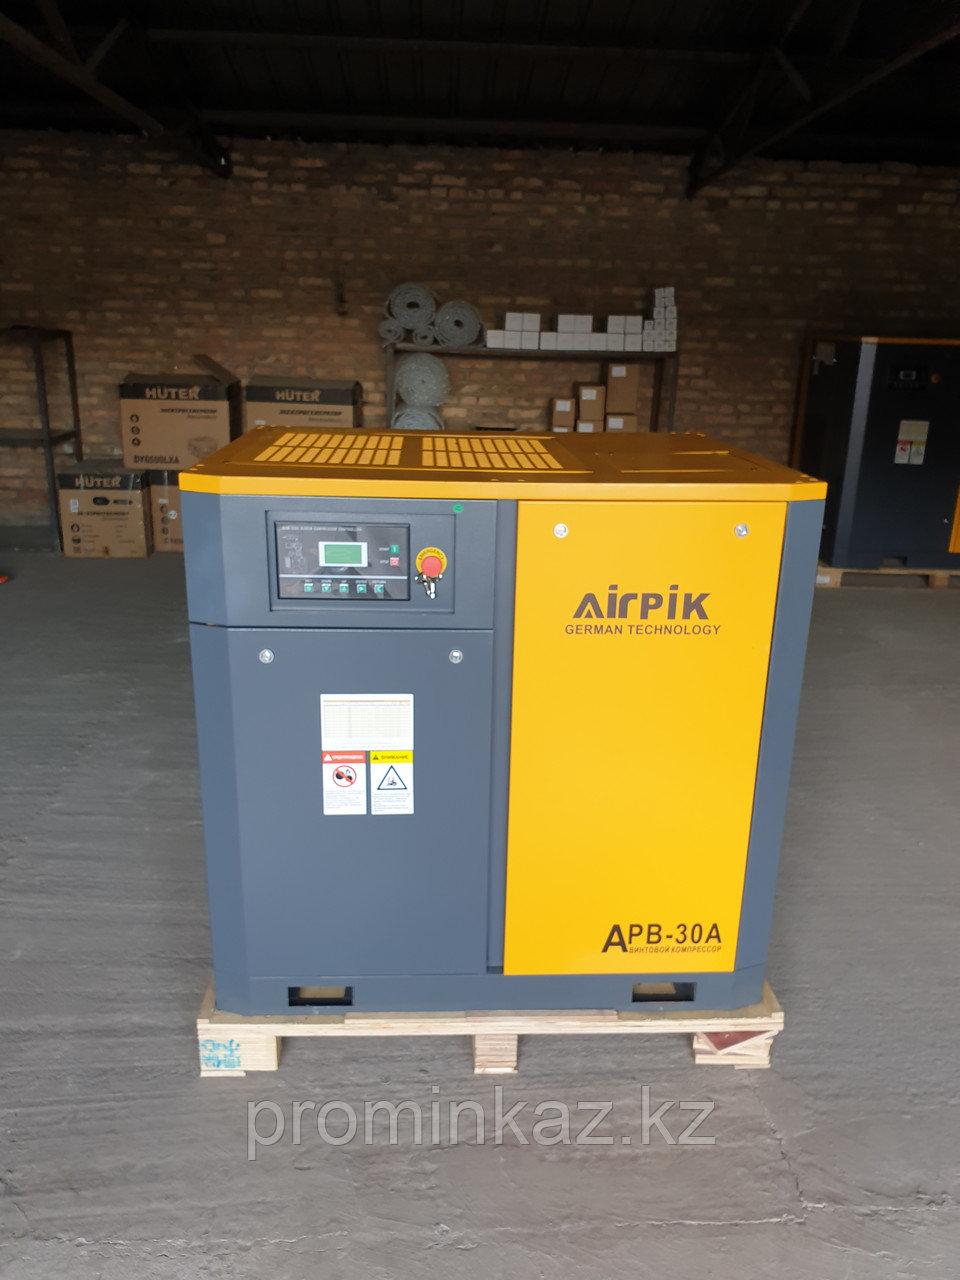 Компрессор APB-30A, -2,8 куб.м, 12 Атм, AirPIK